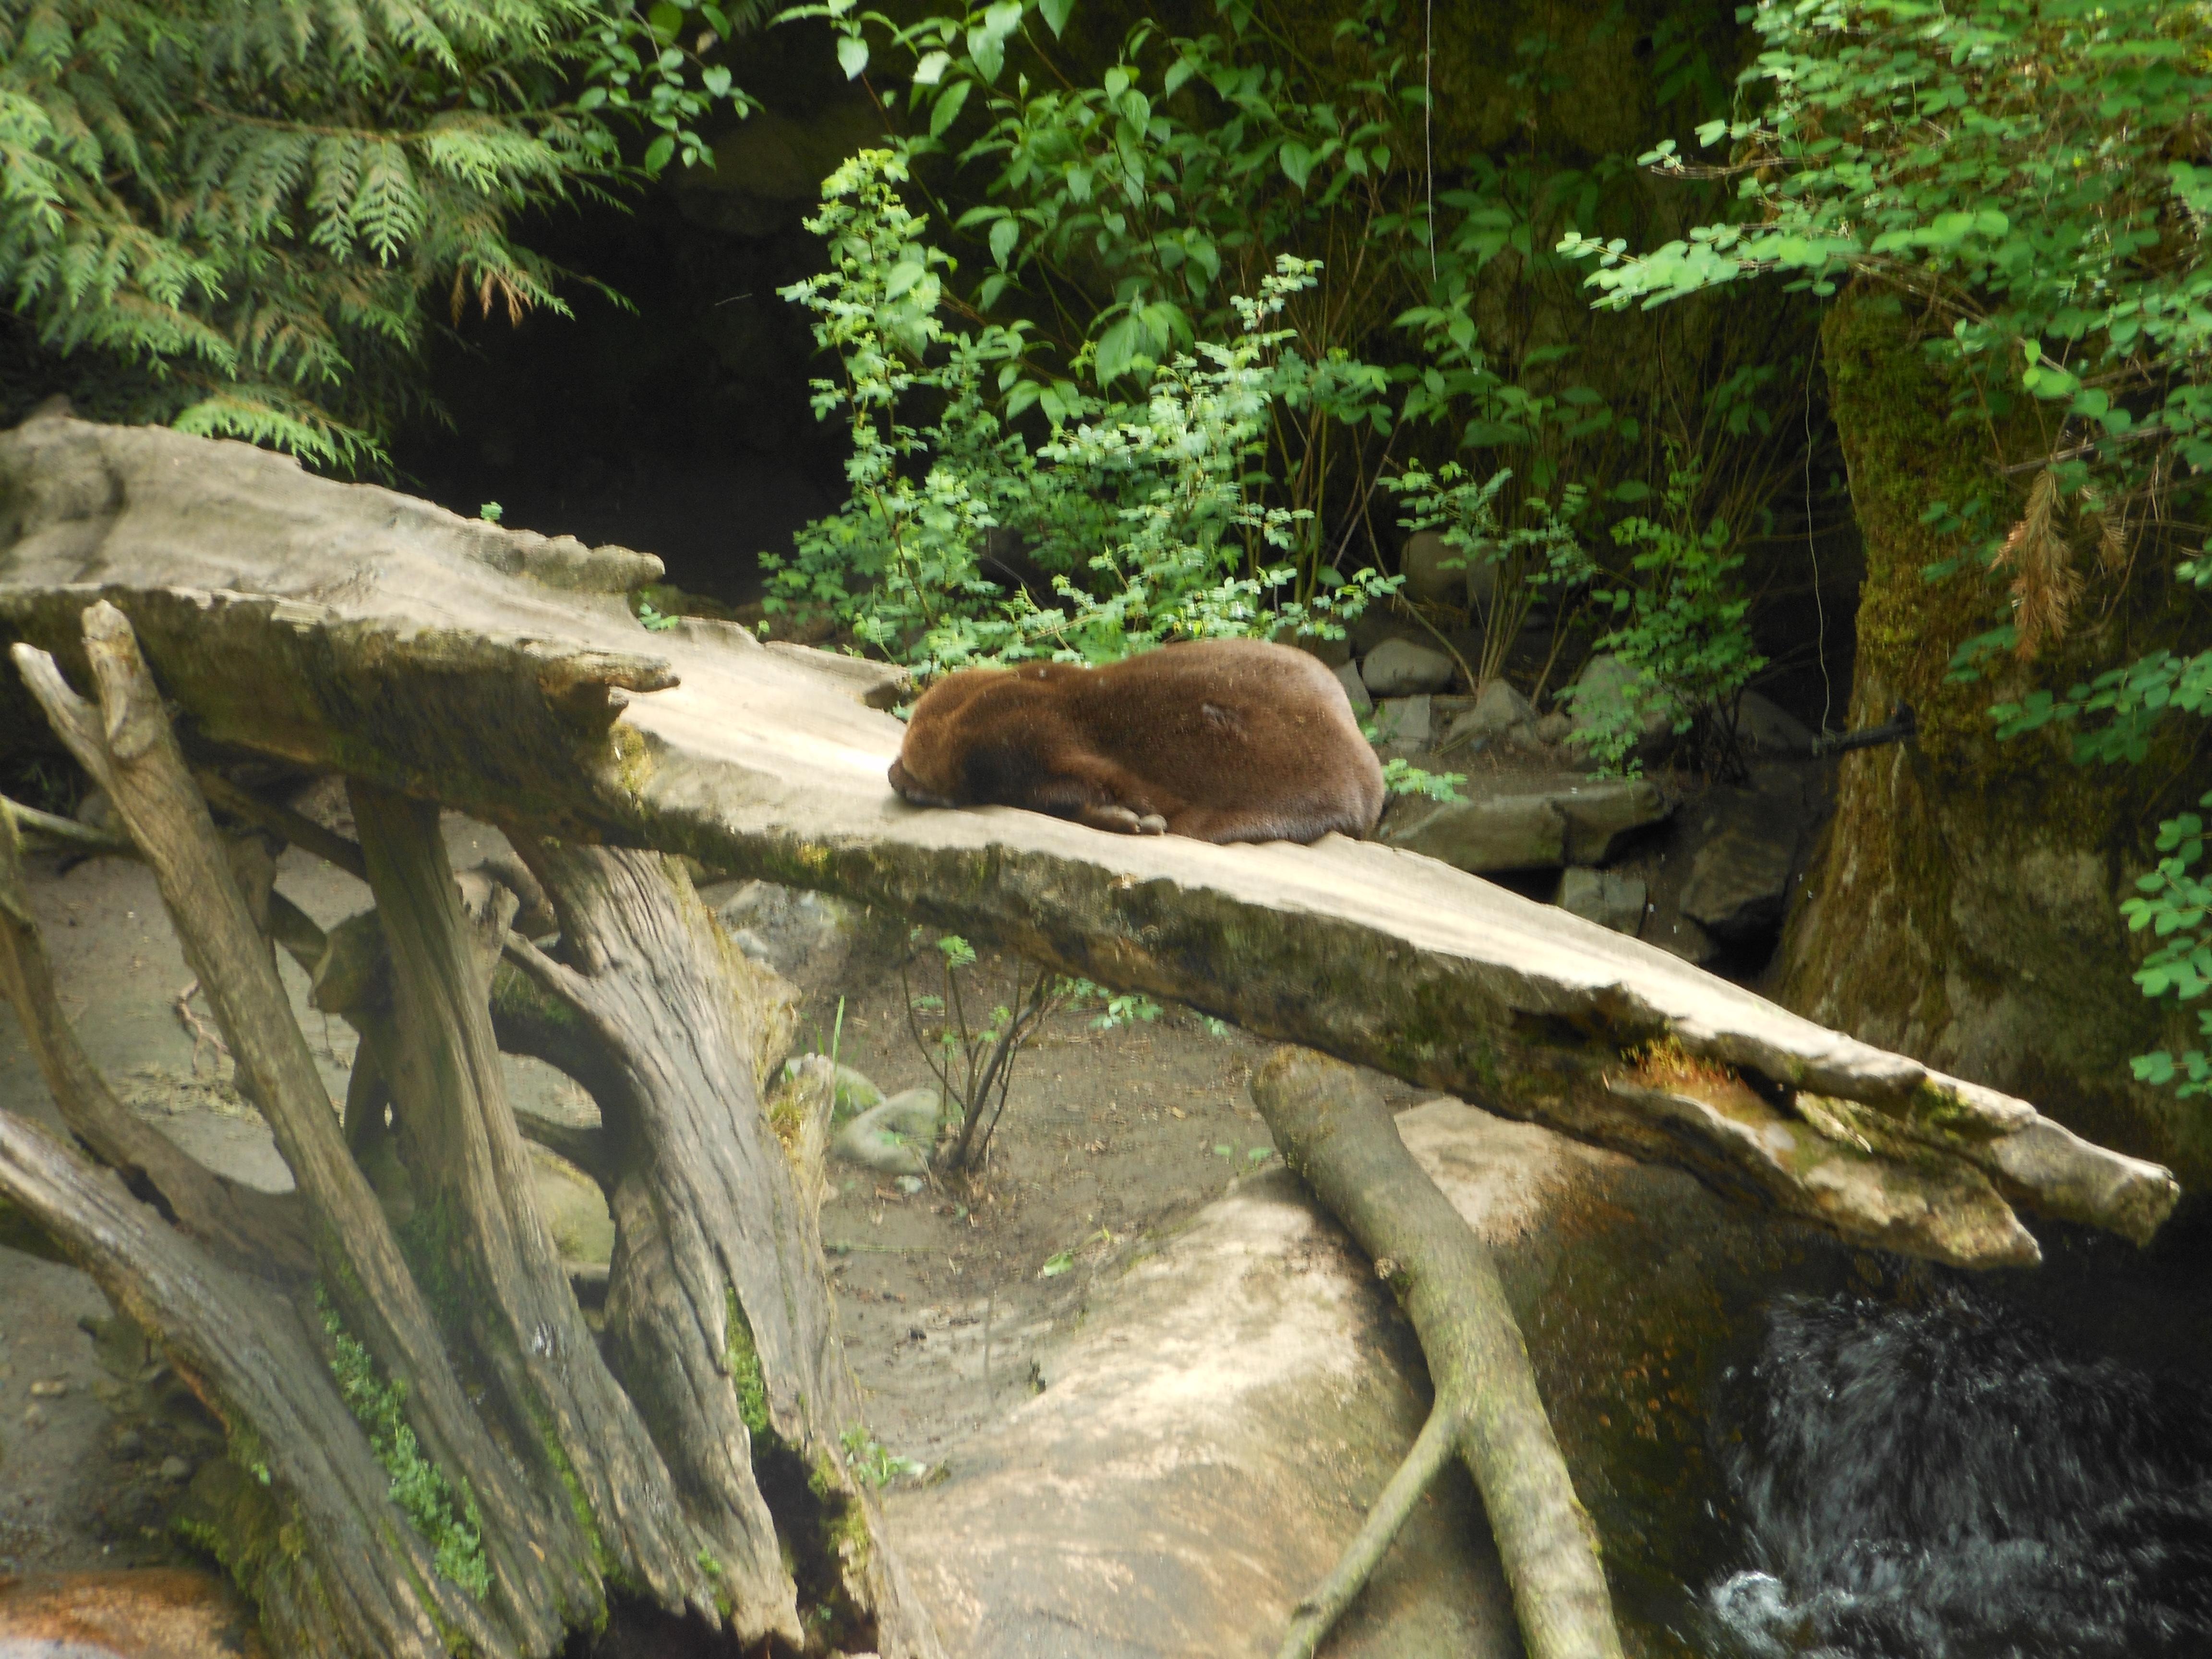 File:Otter, sleeping on a split log - panoramio jpg - Wikimedia Commons